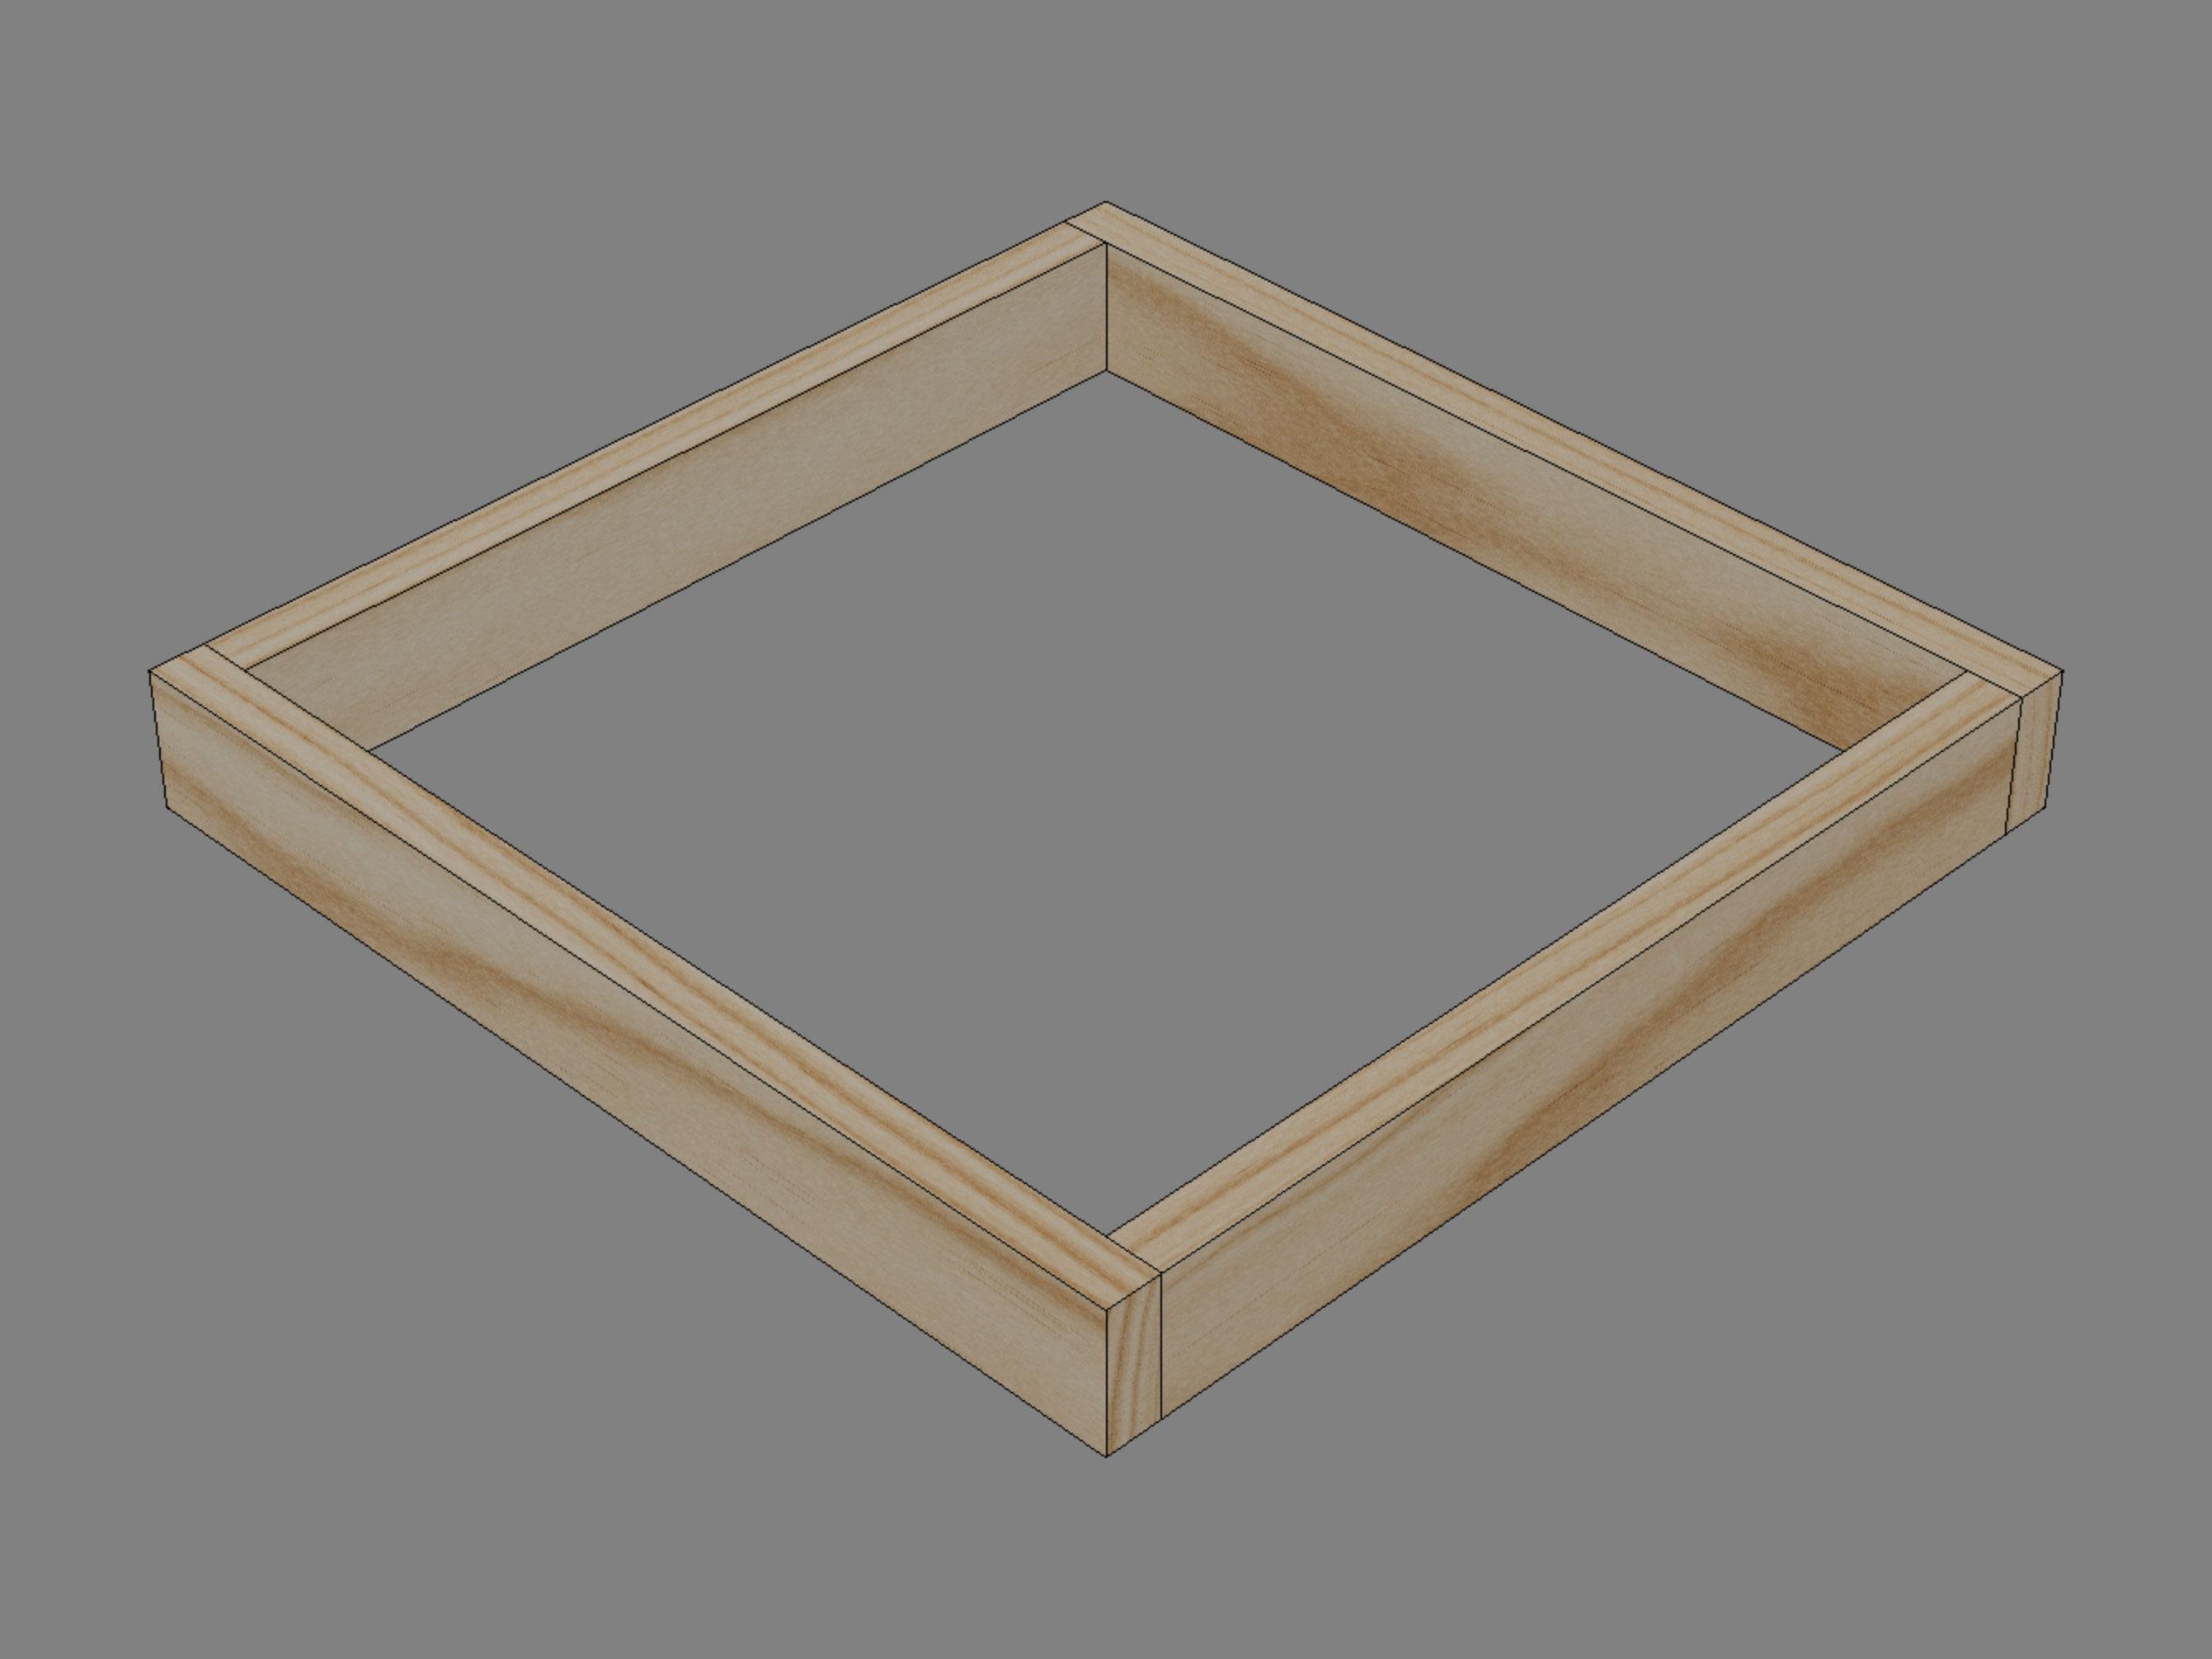 3d_printing_base-step-1.jpg